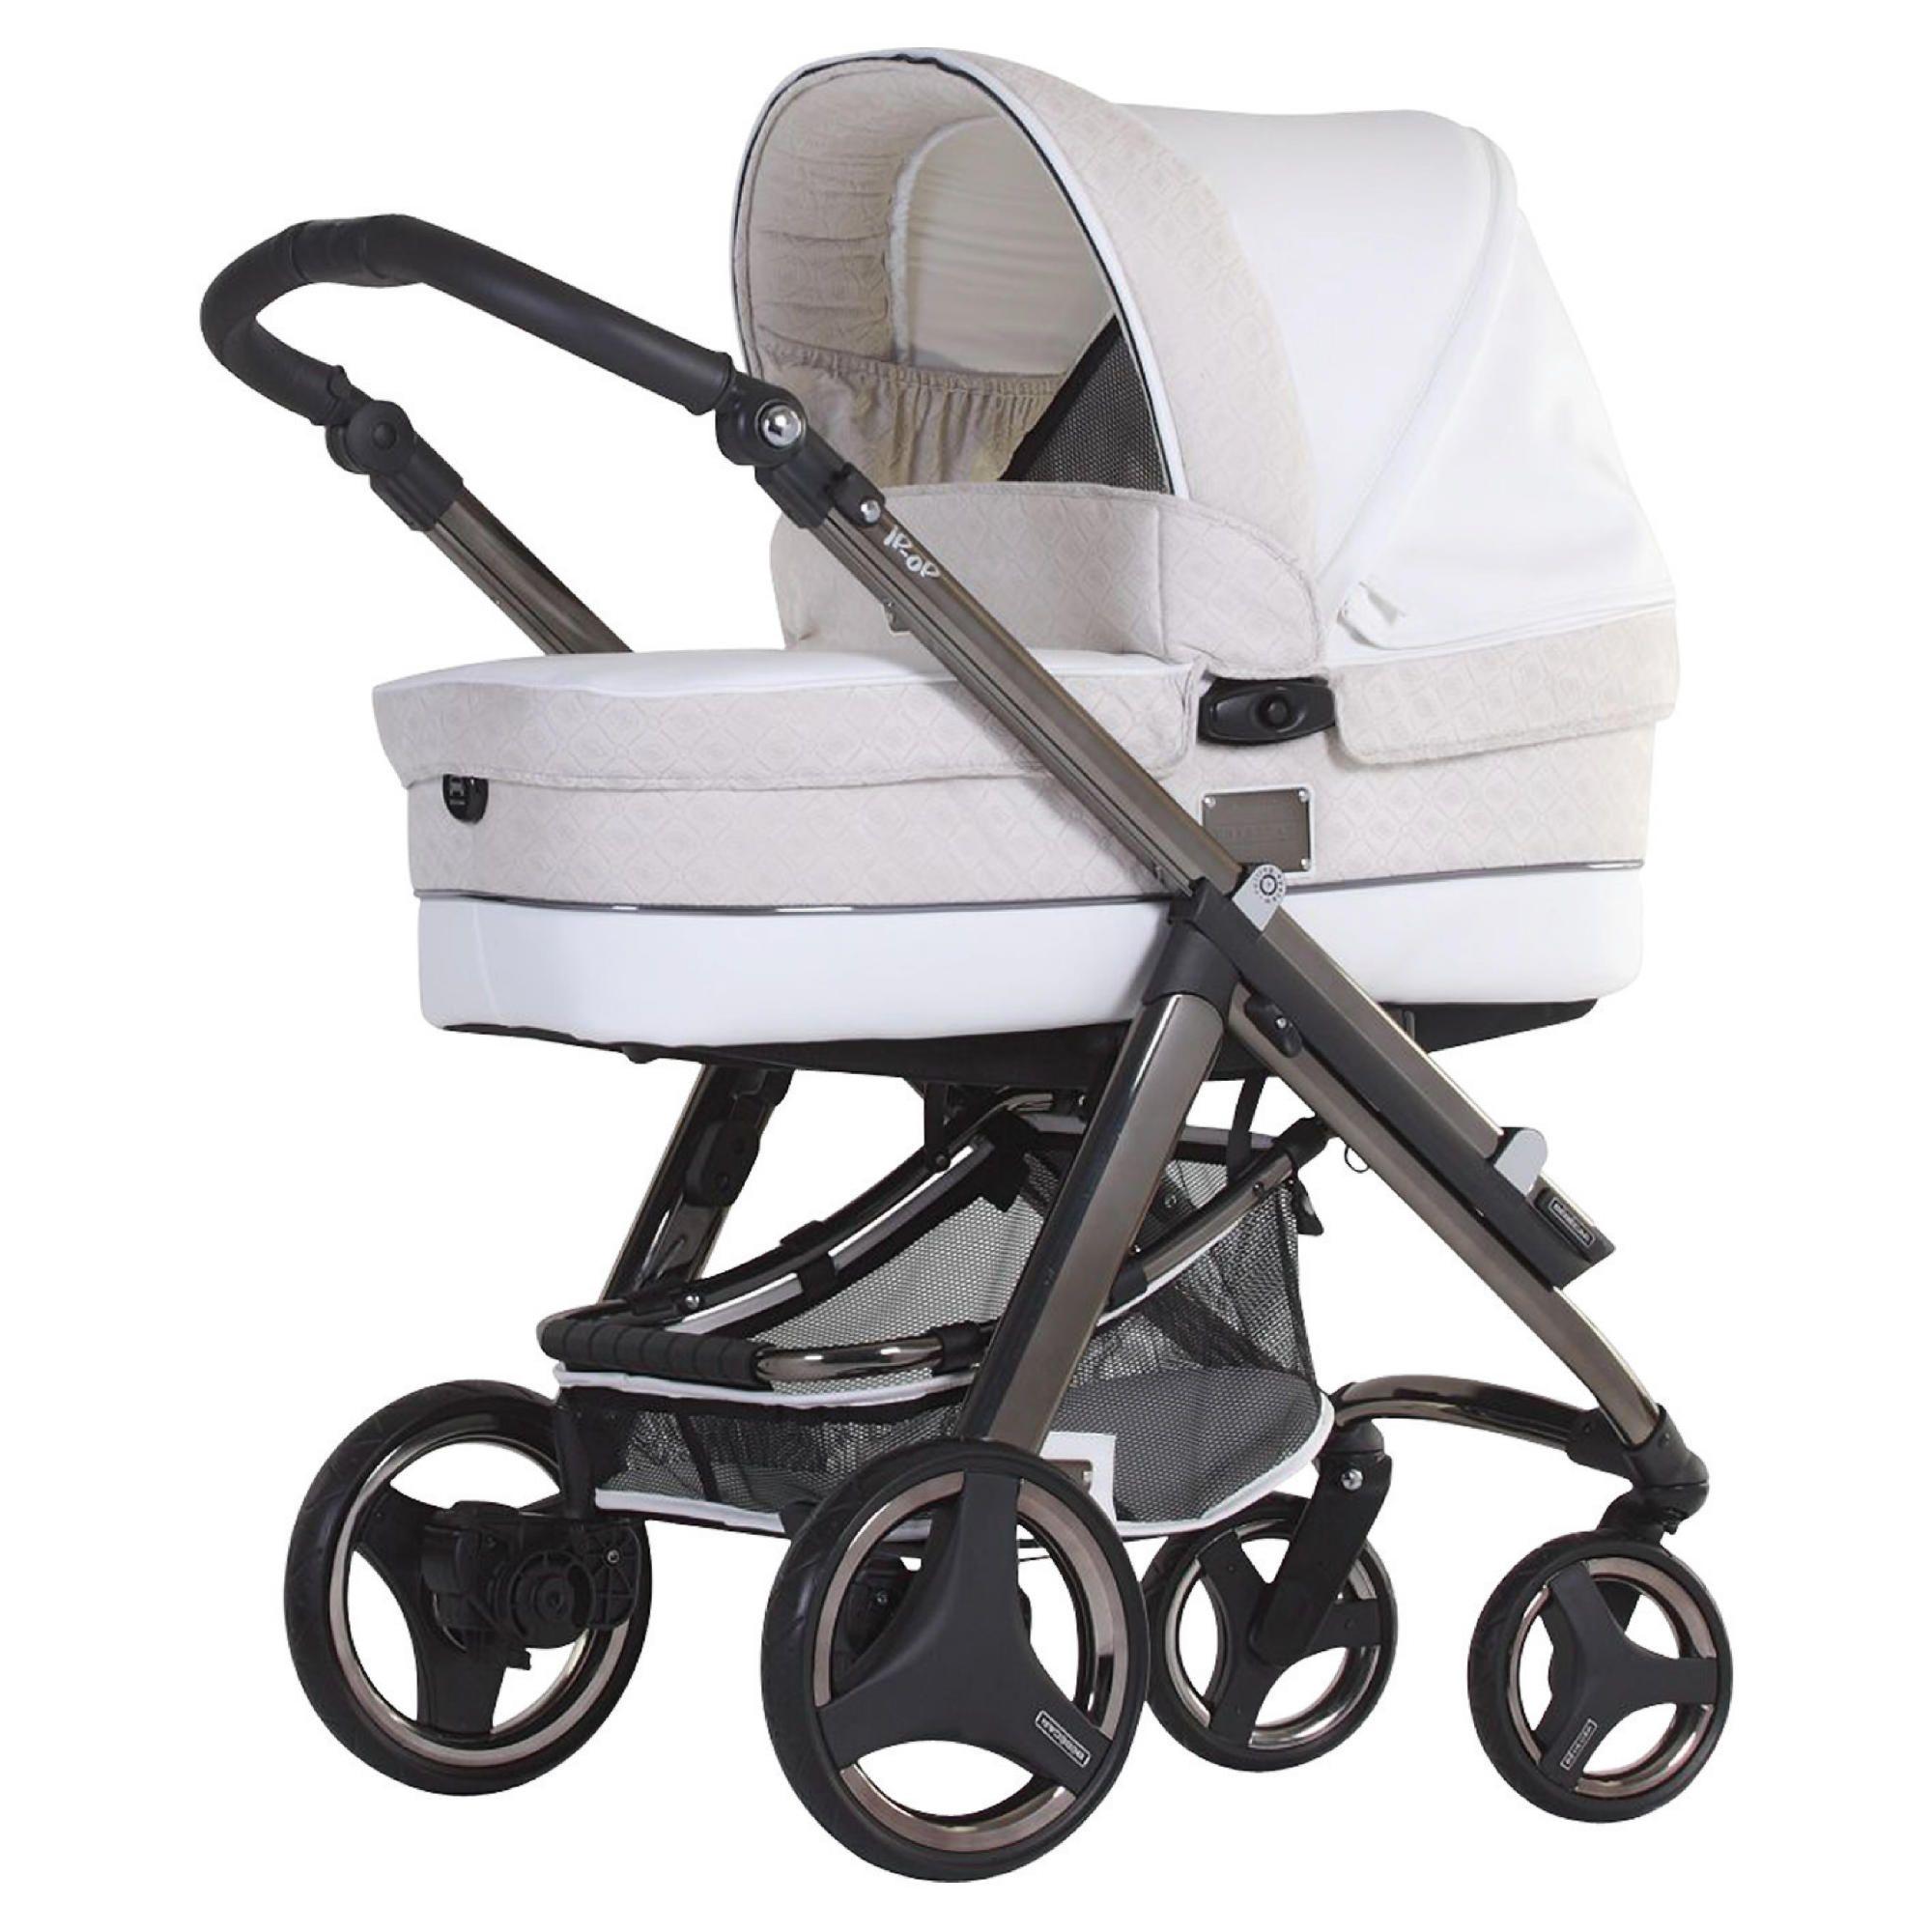 Baby Prams Travel Systems Uk